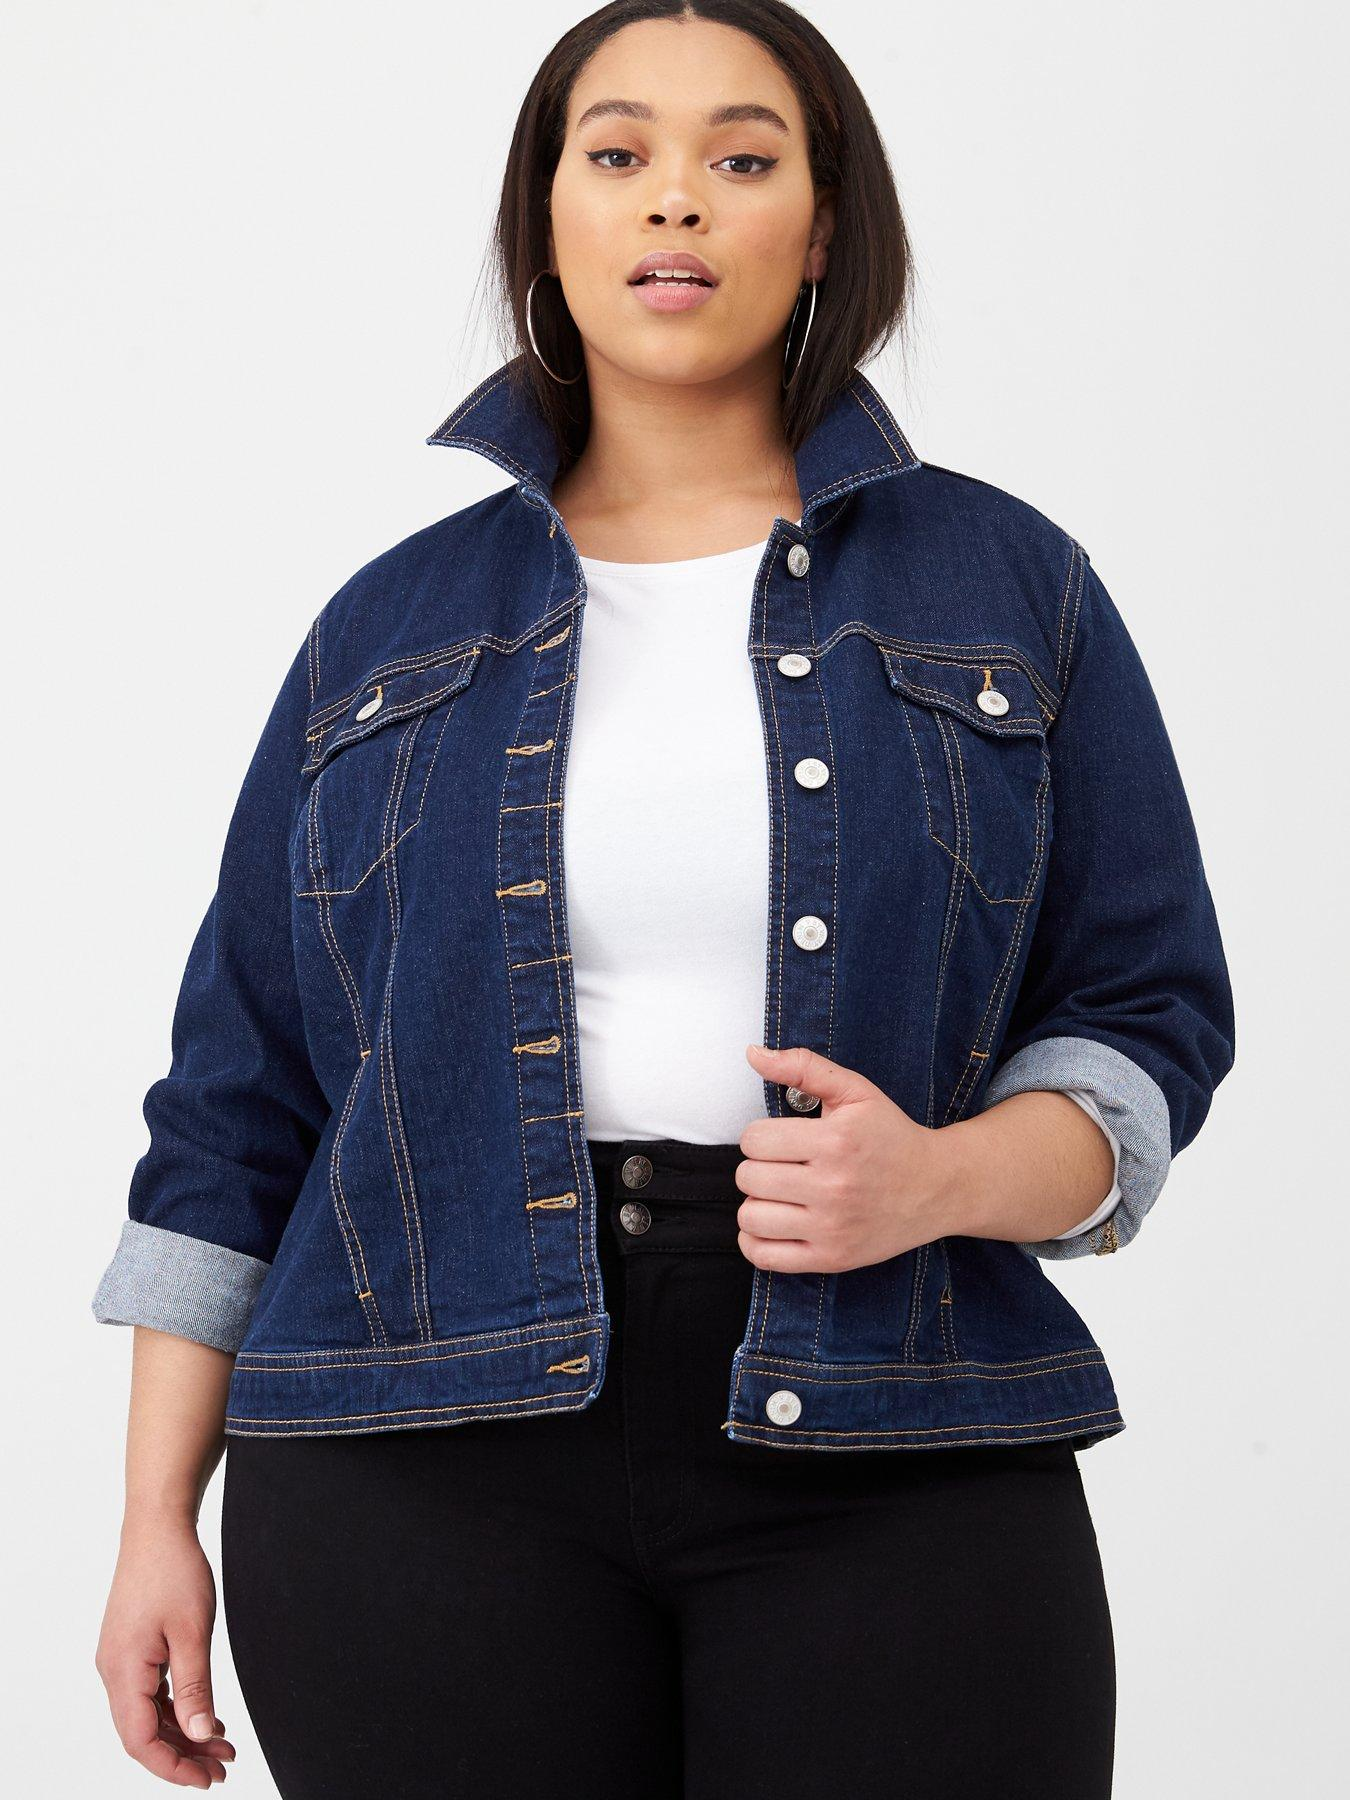 END GAME Women Denim Jacket Pearls Beading Denim Jacket Women Slim Cotton Light Washed Long Sleeve Jacket Coats